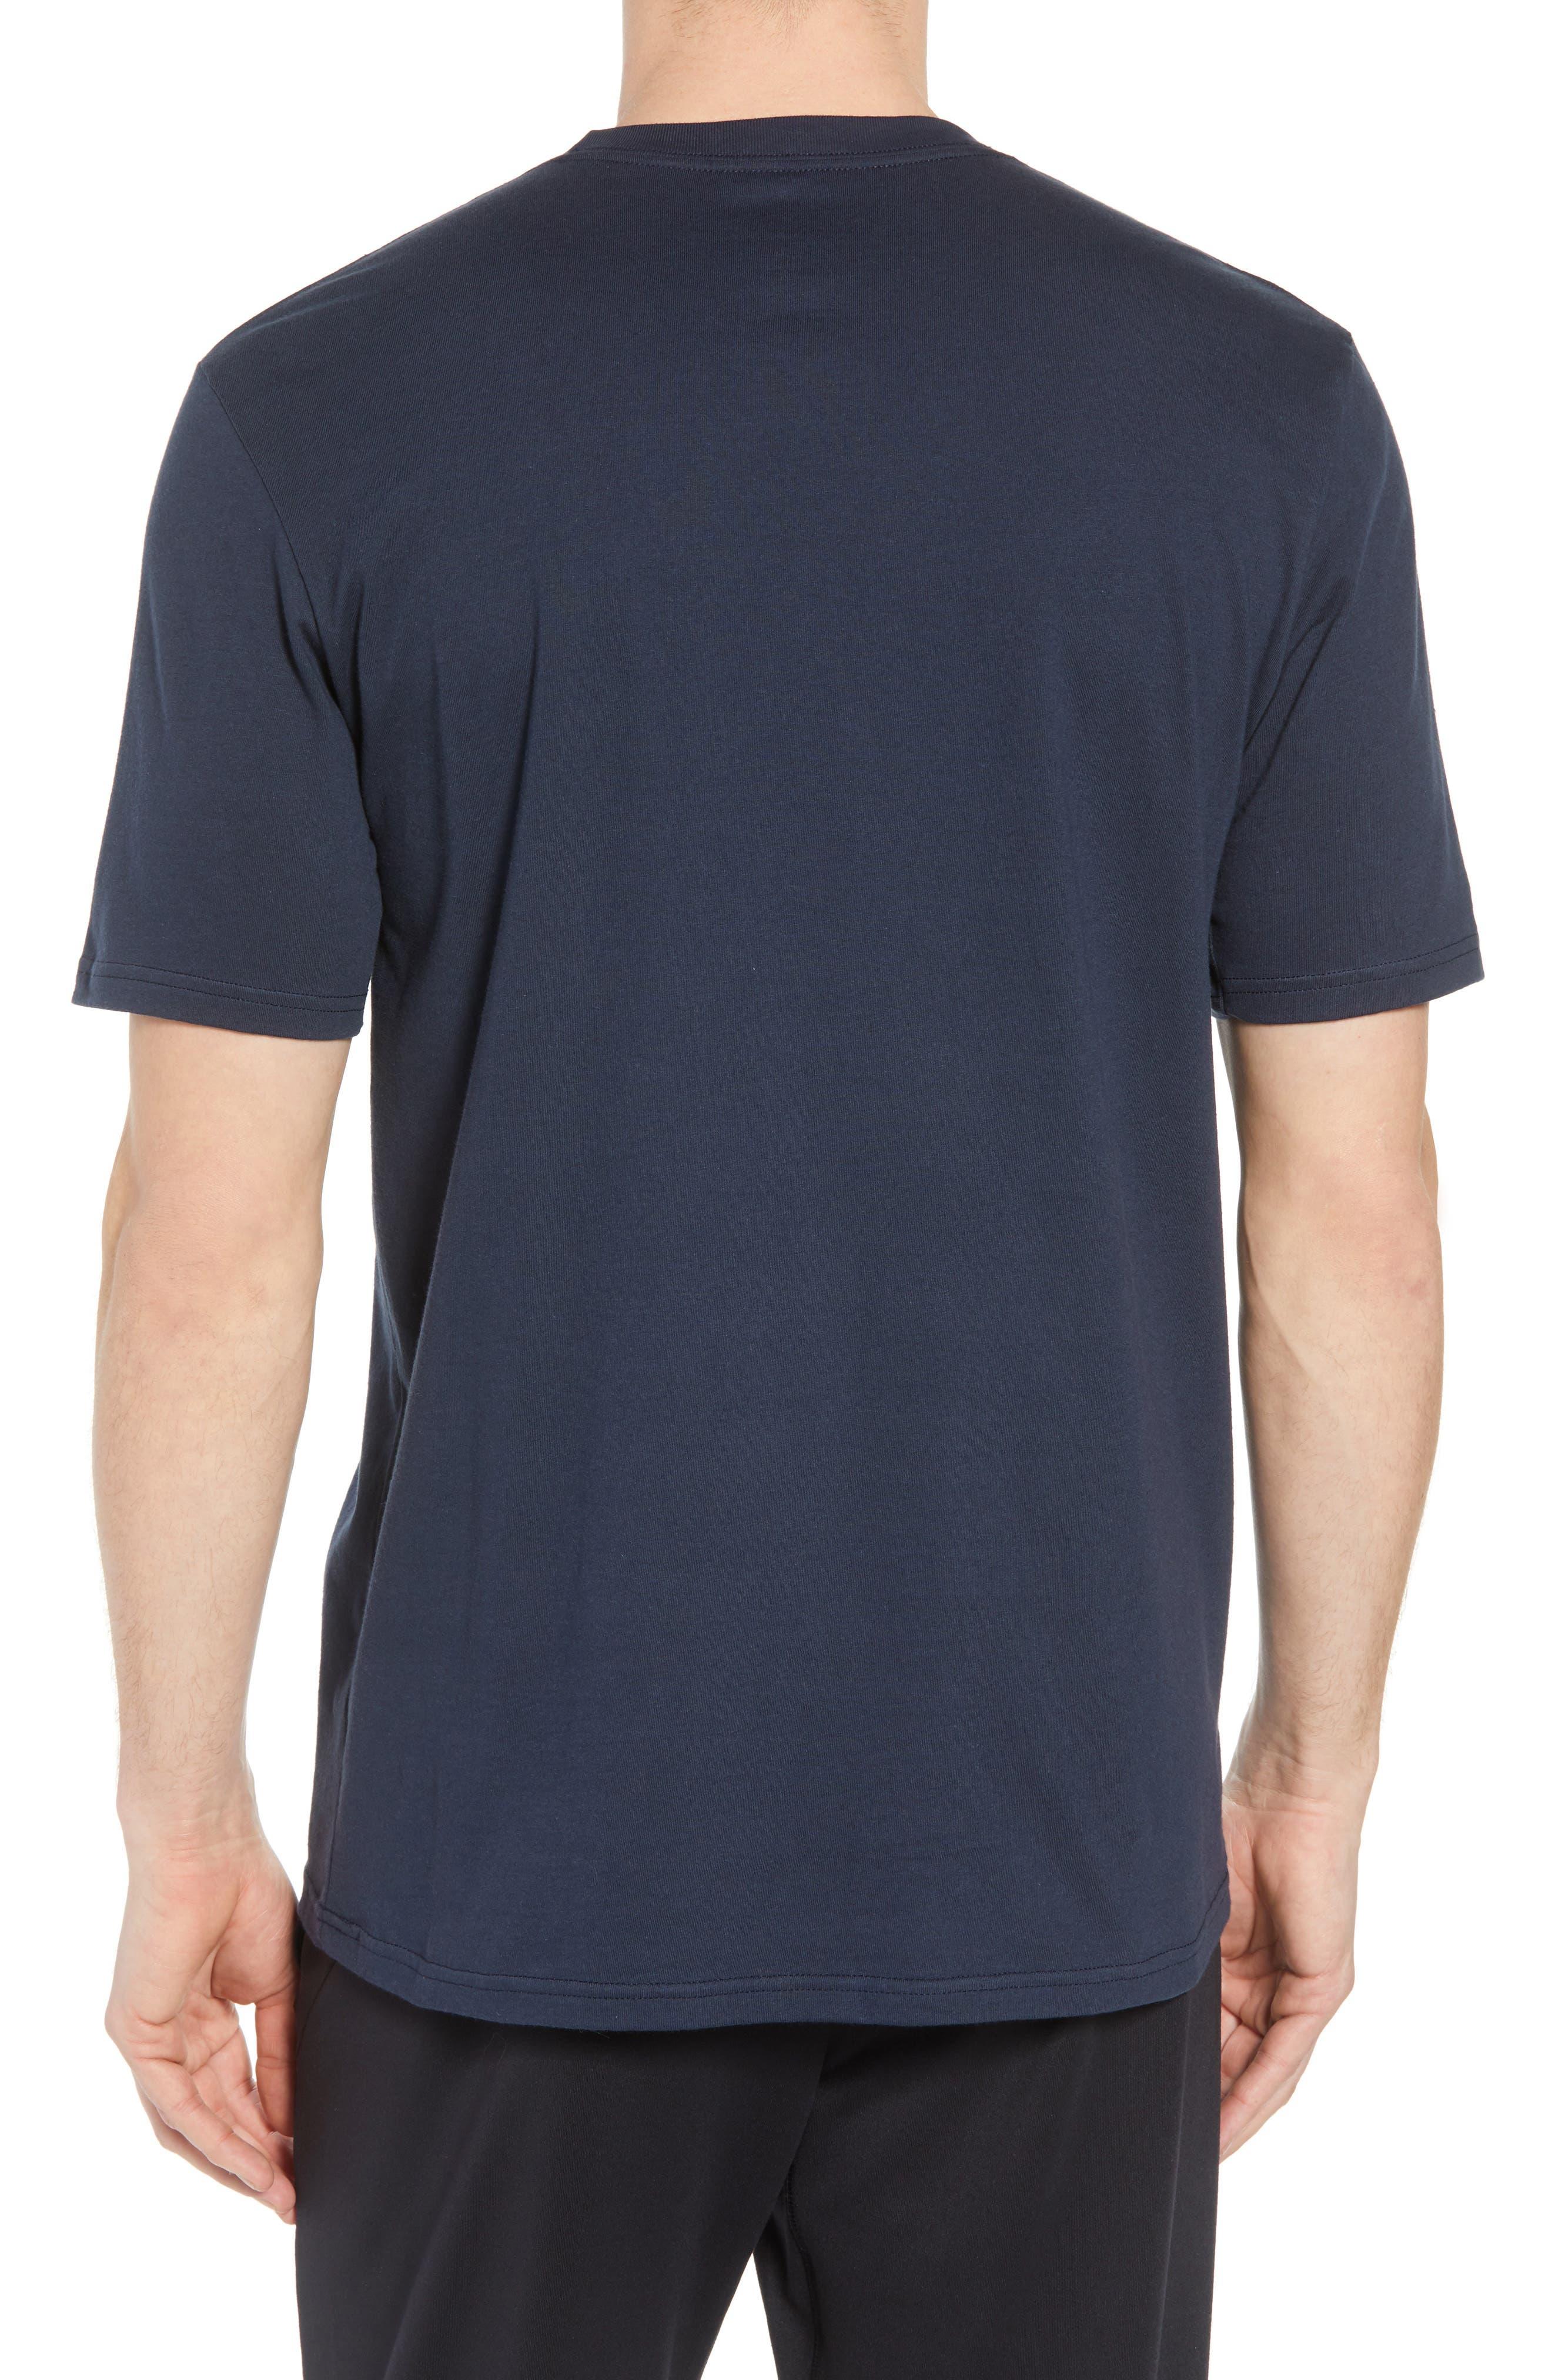 Alternate Image 2  - The North Face 1966 Box Crewneck Cotton T-Shirt